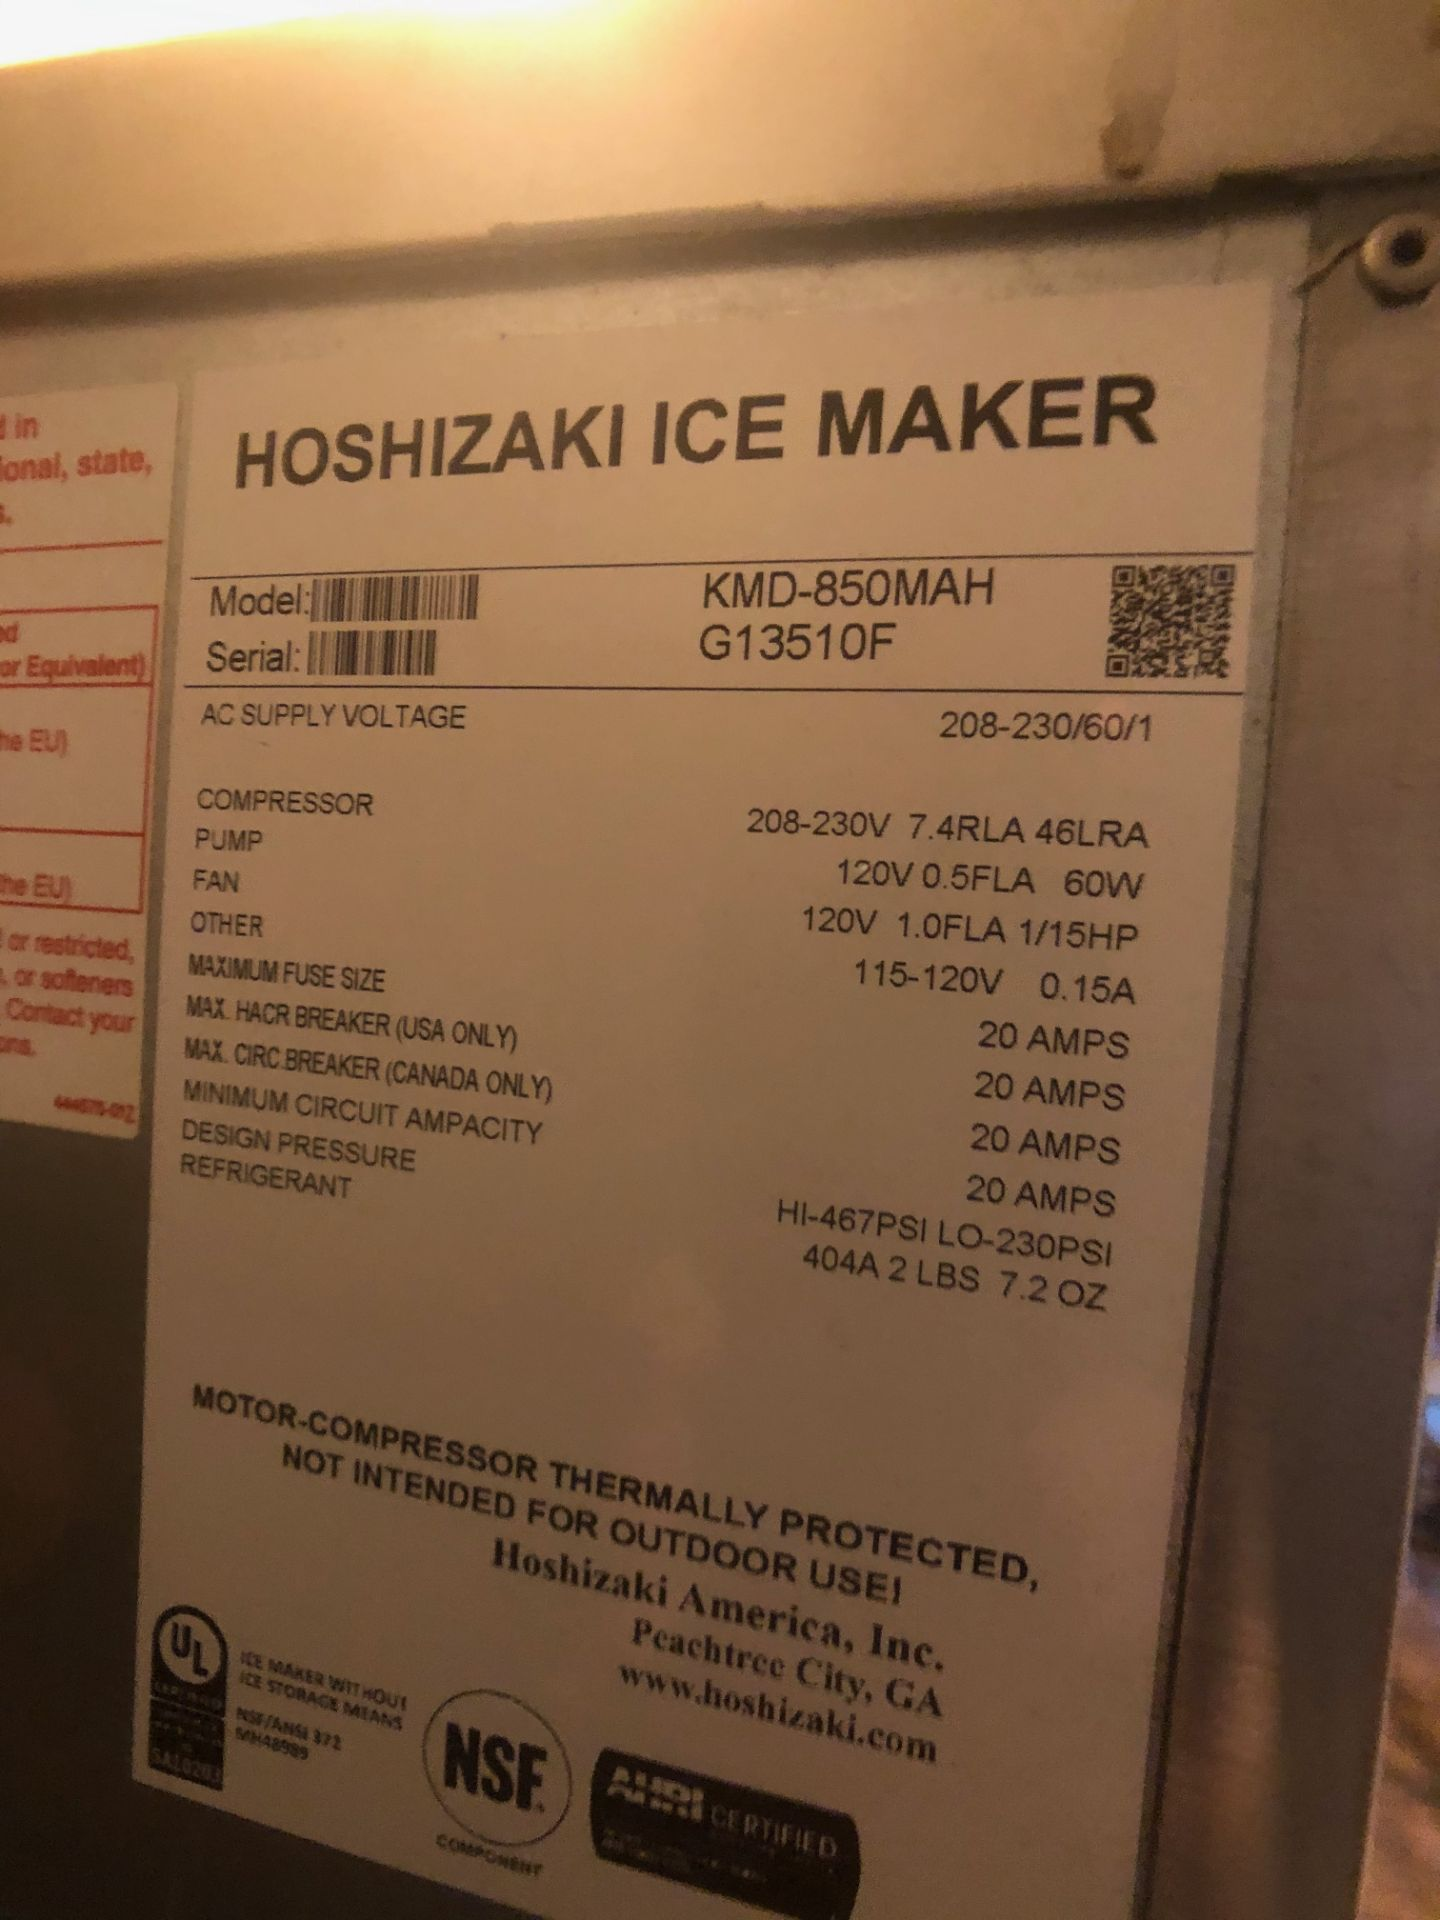 Manitowoc Beverage Systems 10-Valve Soft Drink Dispenser, Model SV250, S/N 610202454, with Hoshizaki - Image 7 of 10